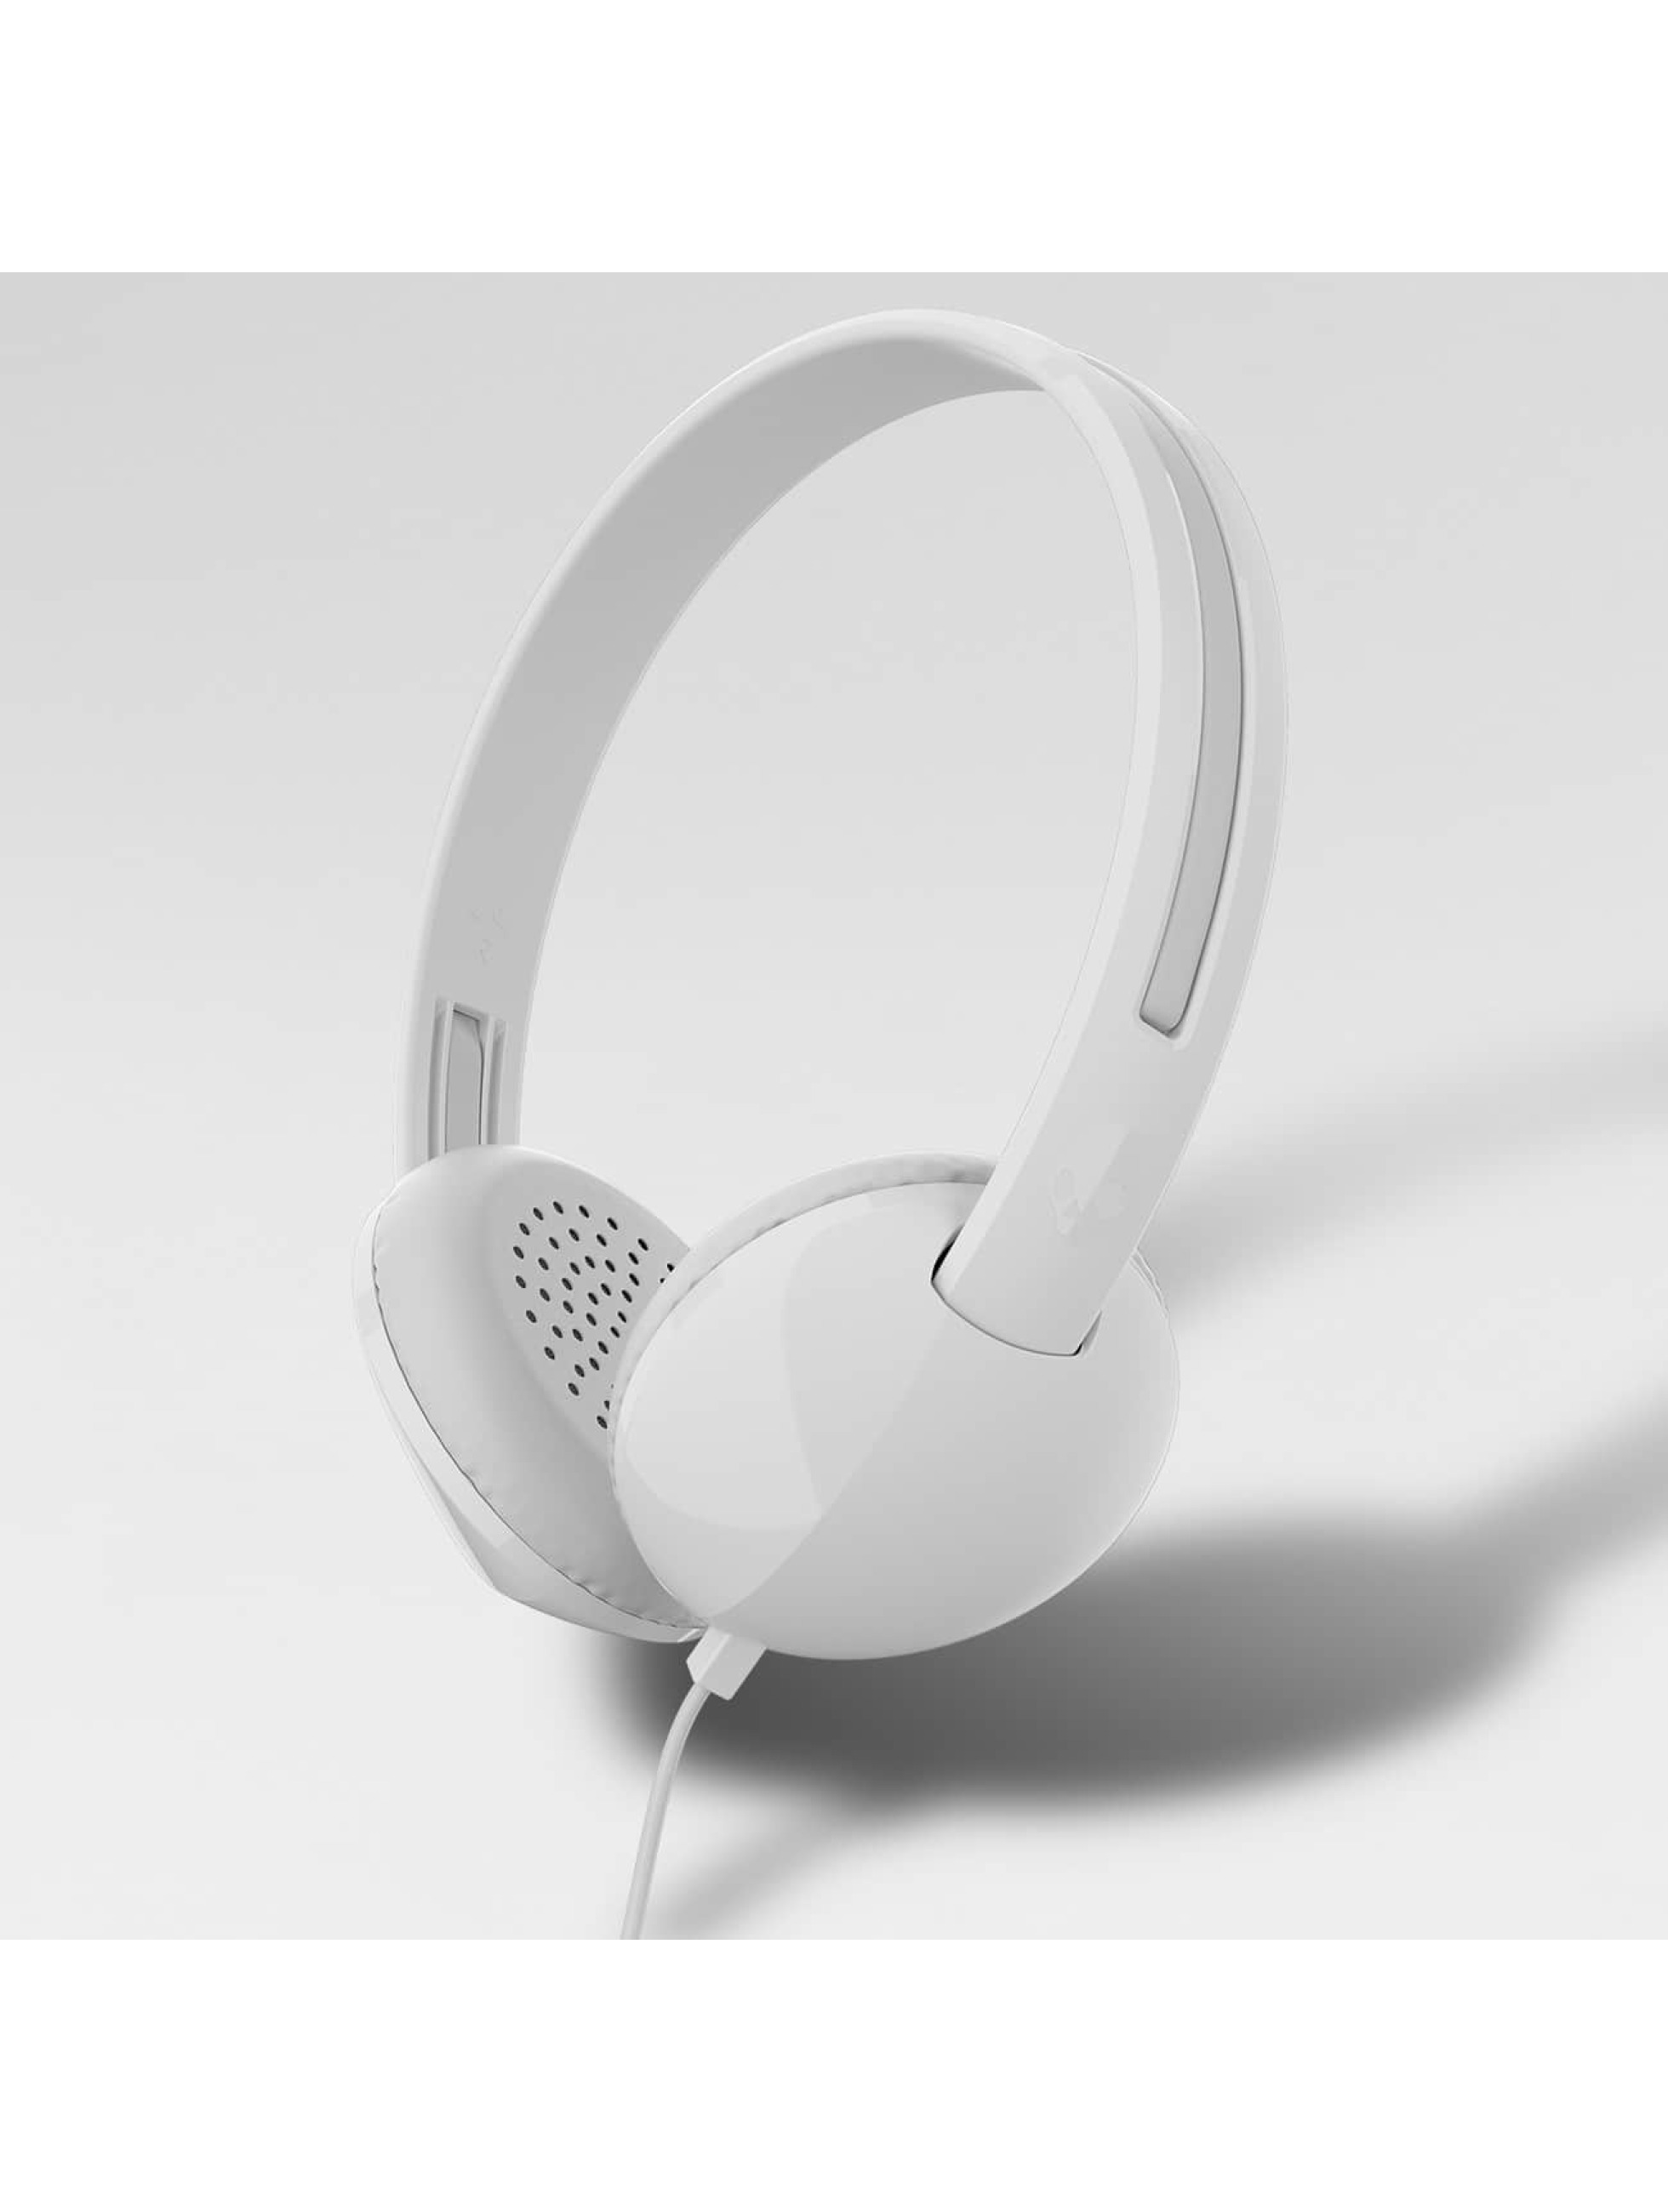 Skullcandy Koptelefoon Stim Mic 1 On Ear wit